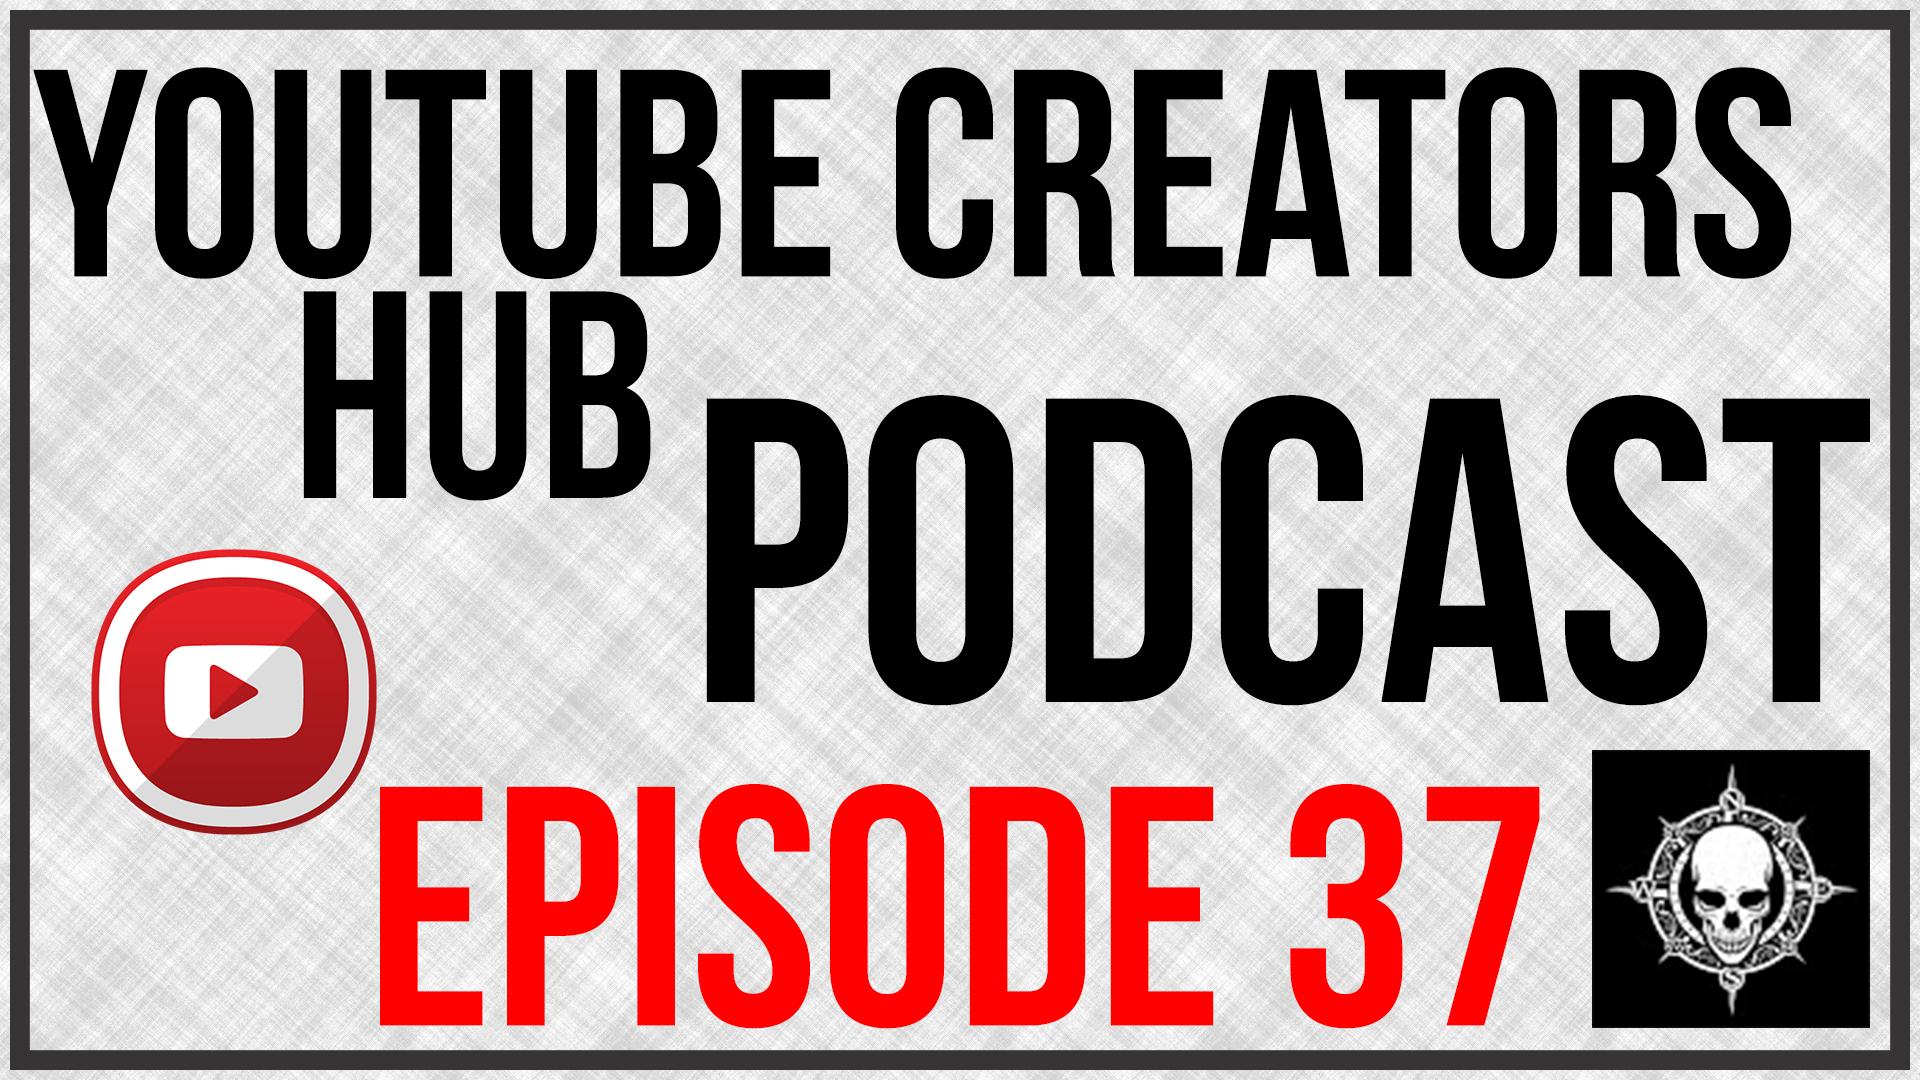 YouTube Creators Hub Podcast Episode 37